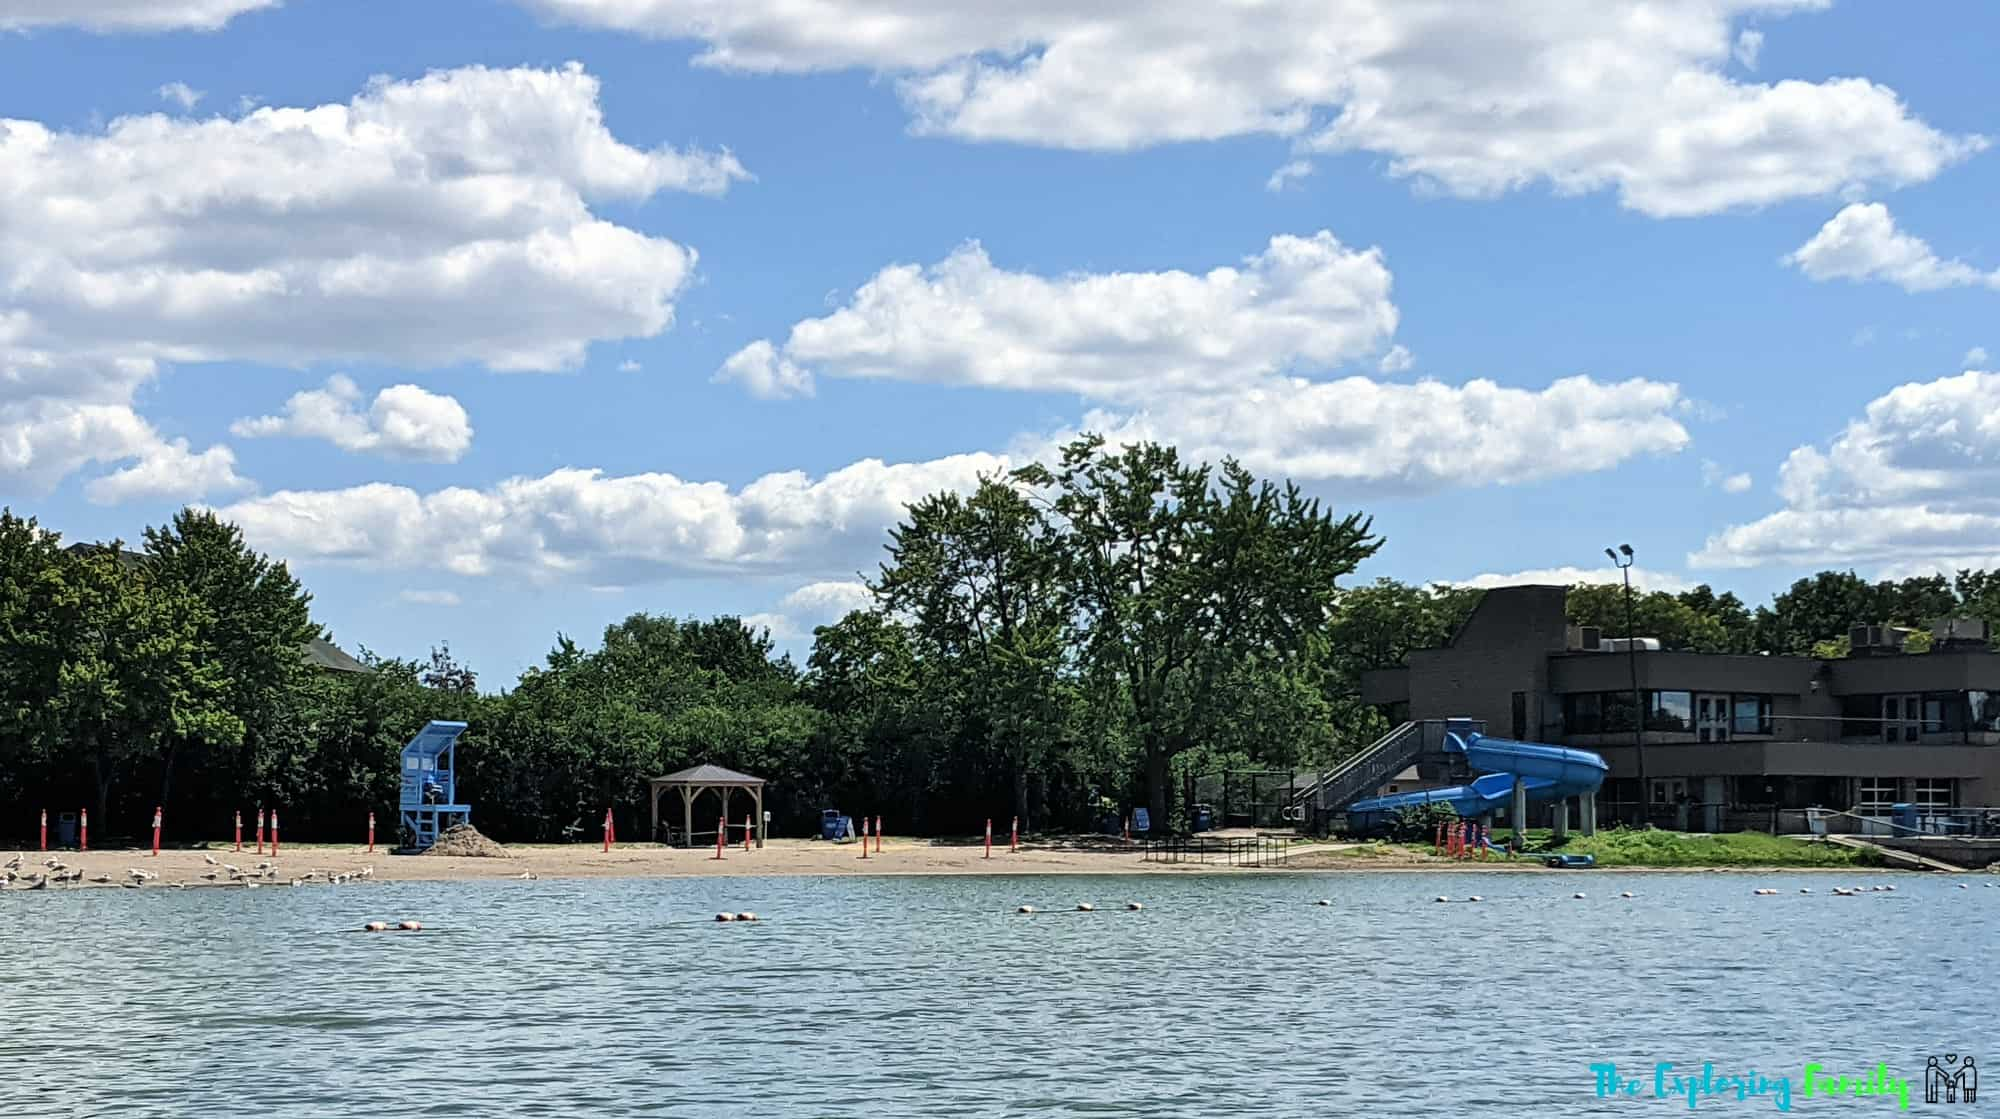 professor's lake brampton beach water slide